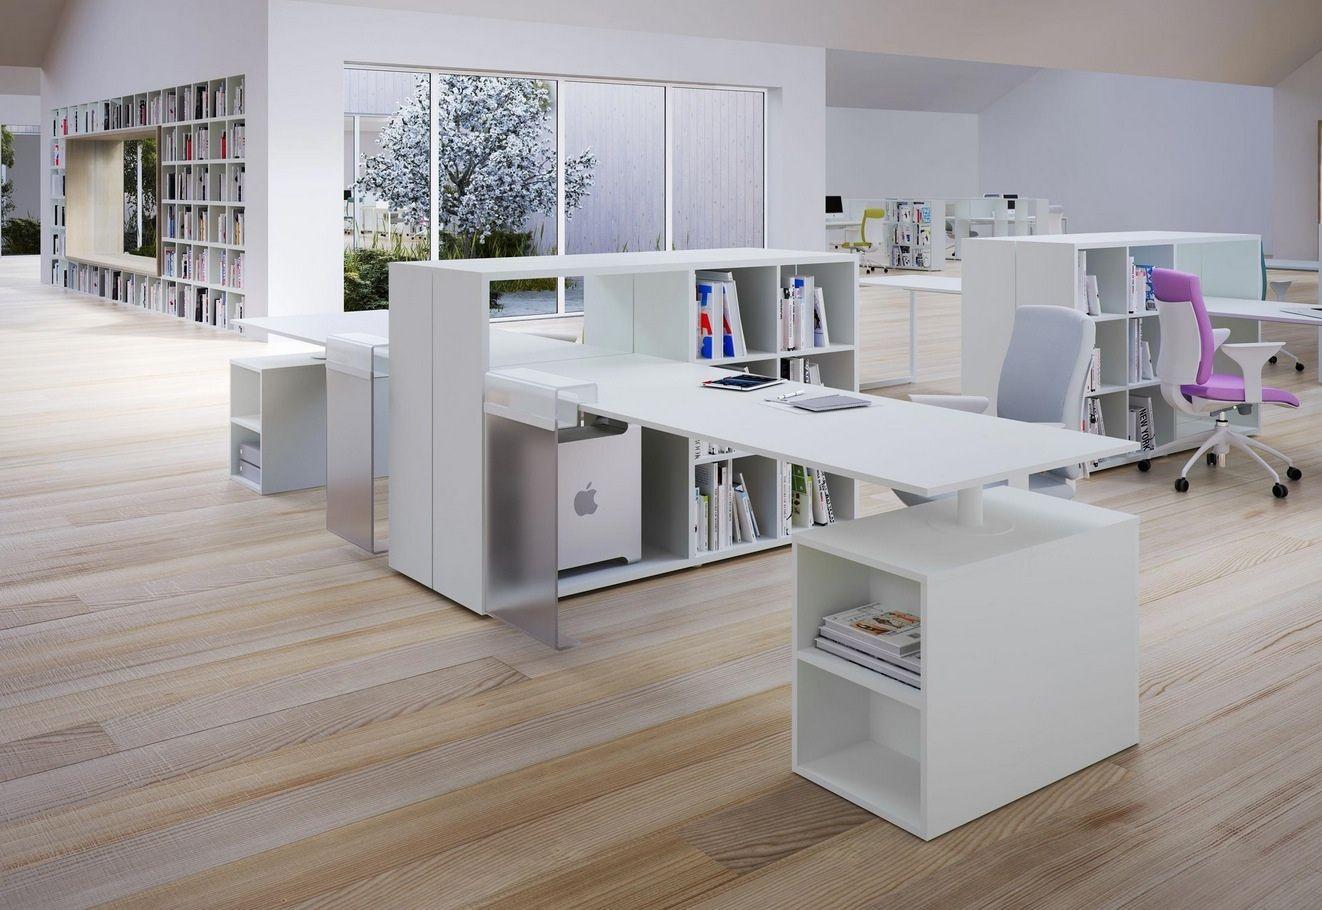 filewmuk office kitchen 1jpg. impressive fair luxury office desk magnificent furniturethe best beautiful throughout design filewmuk kitchen 1jpg e